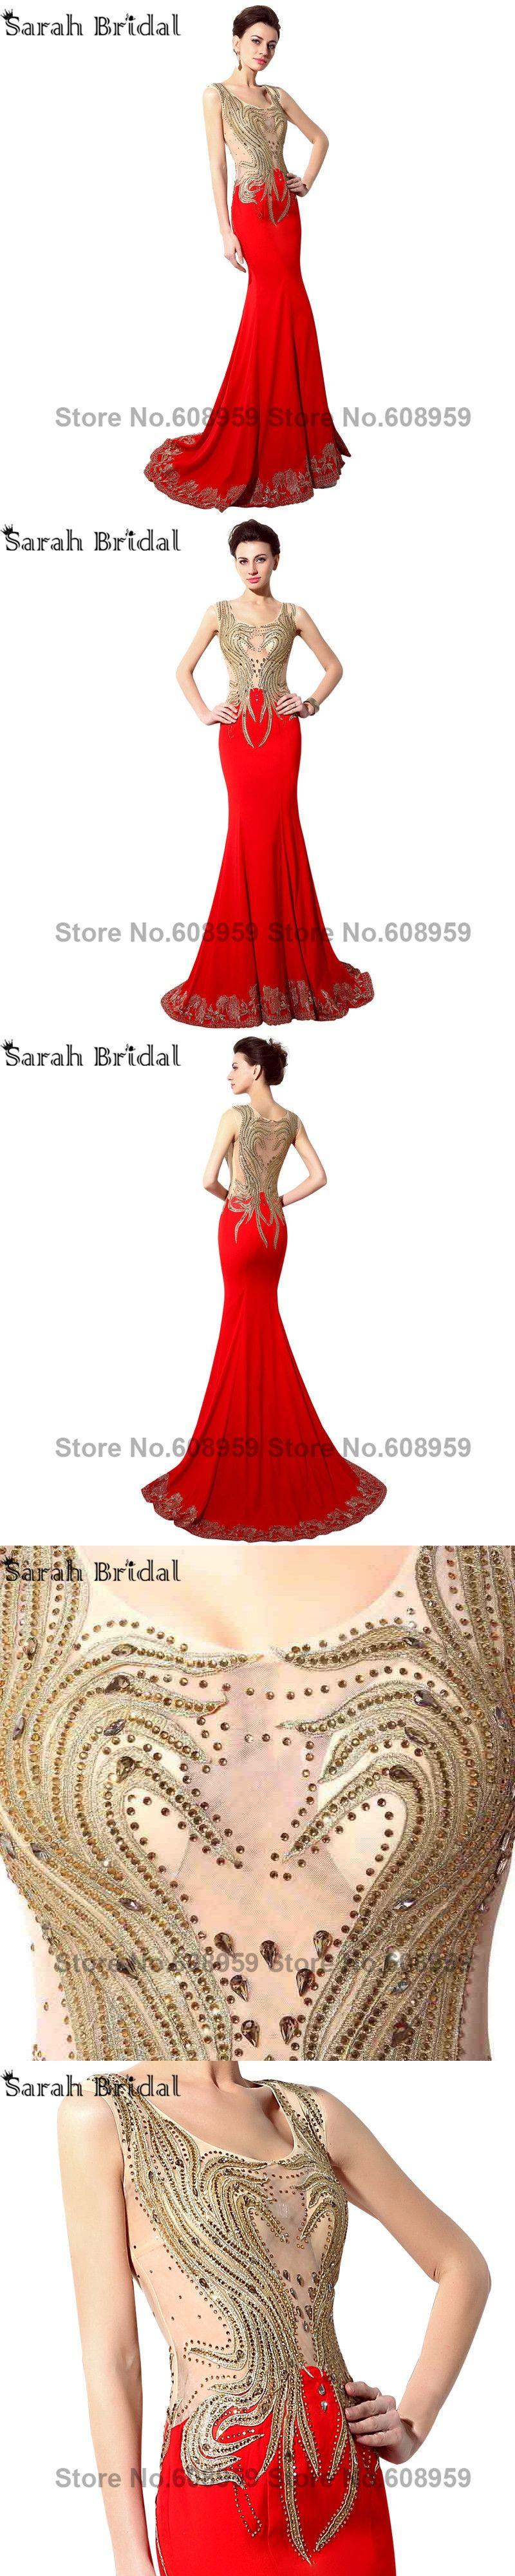 Arabic illusion gold crystal mermaid prom dresses sexy see through